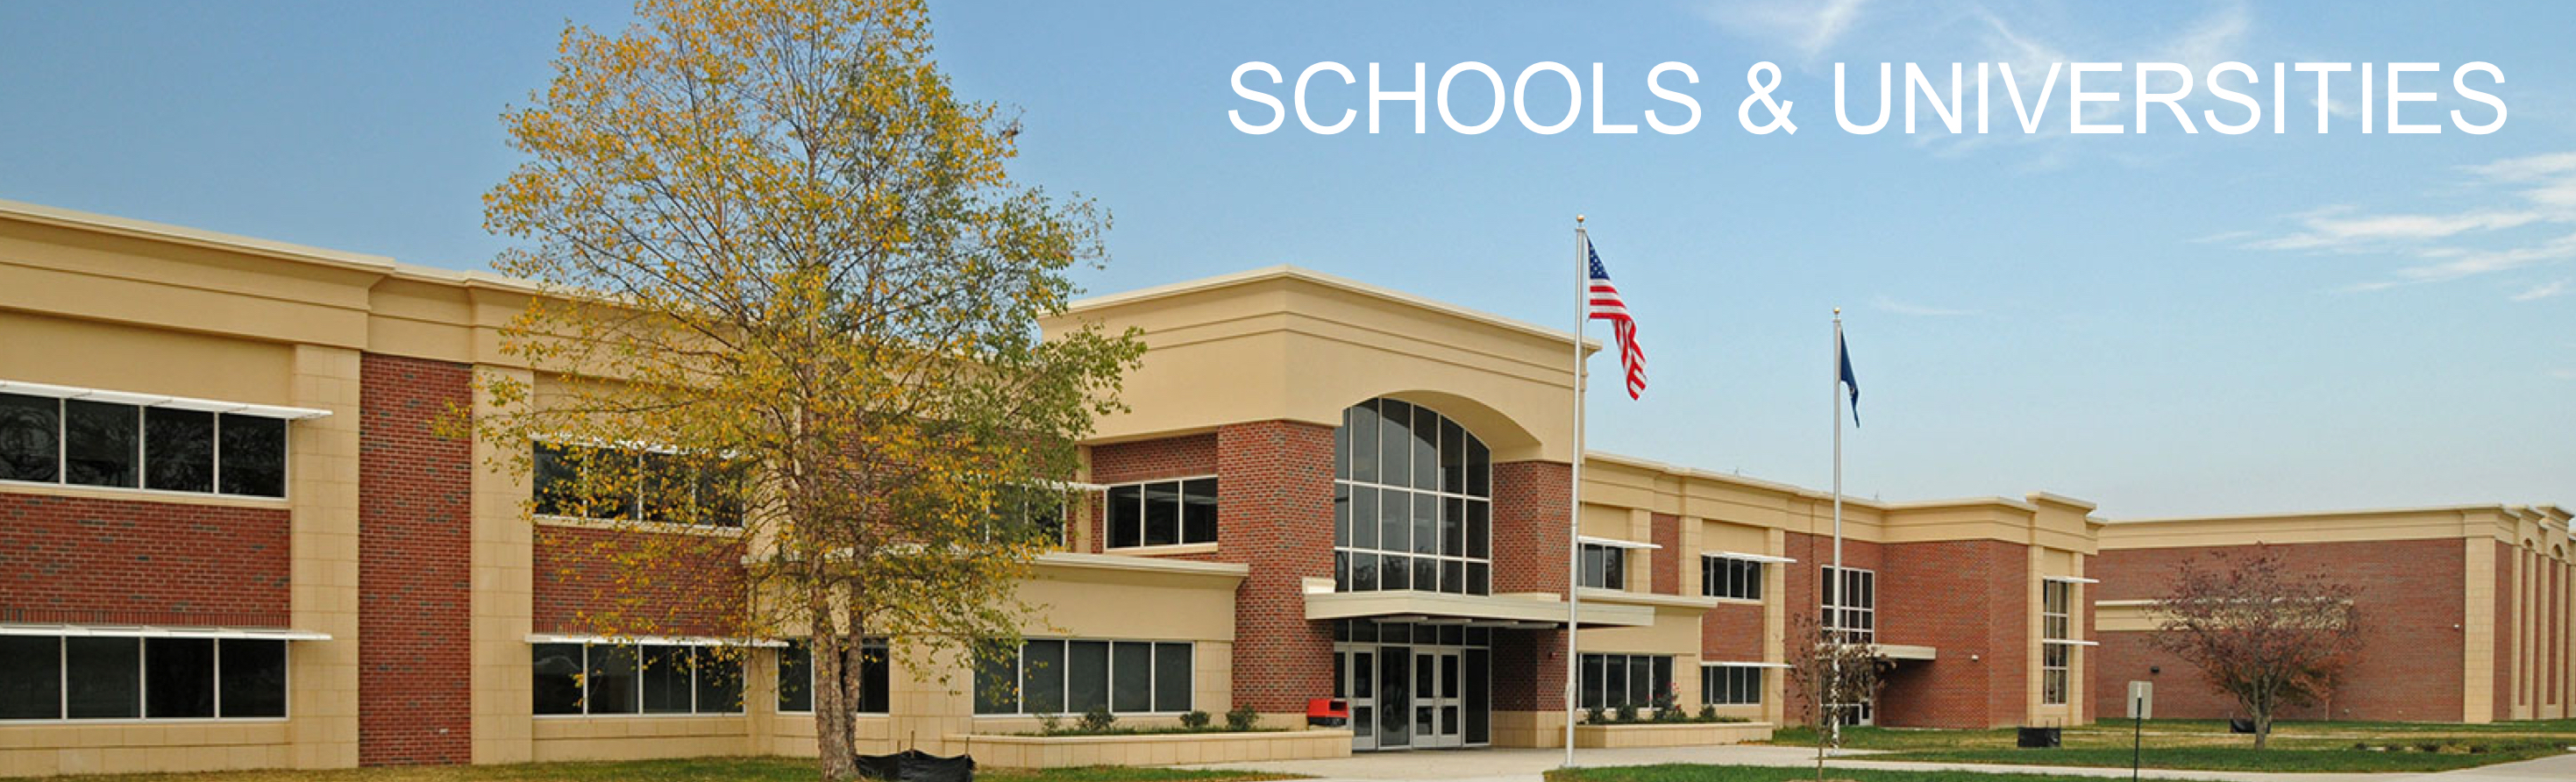 School balgerhoeke